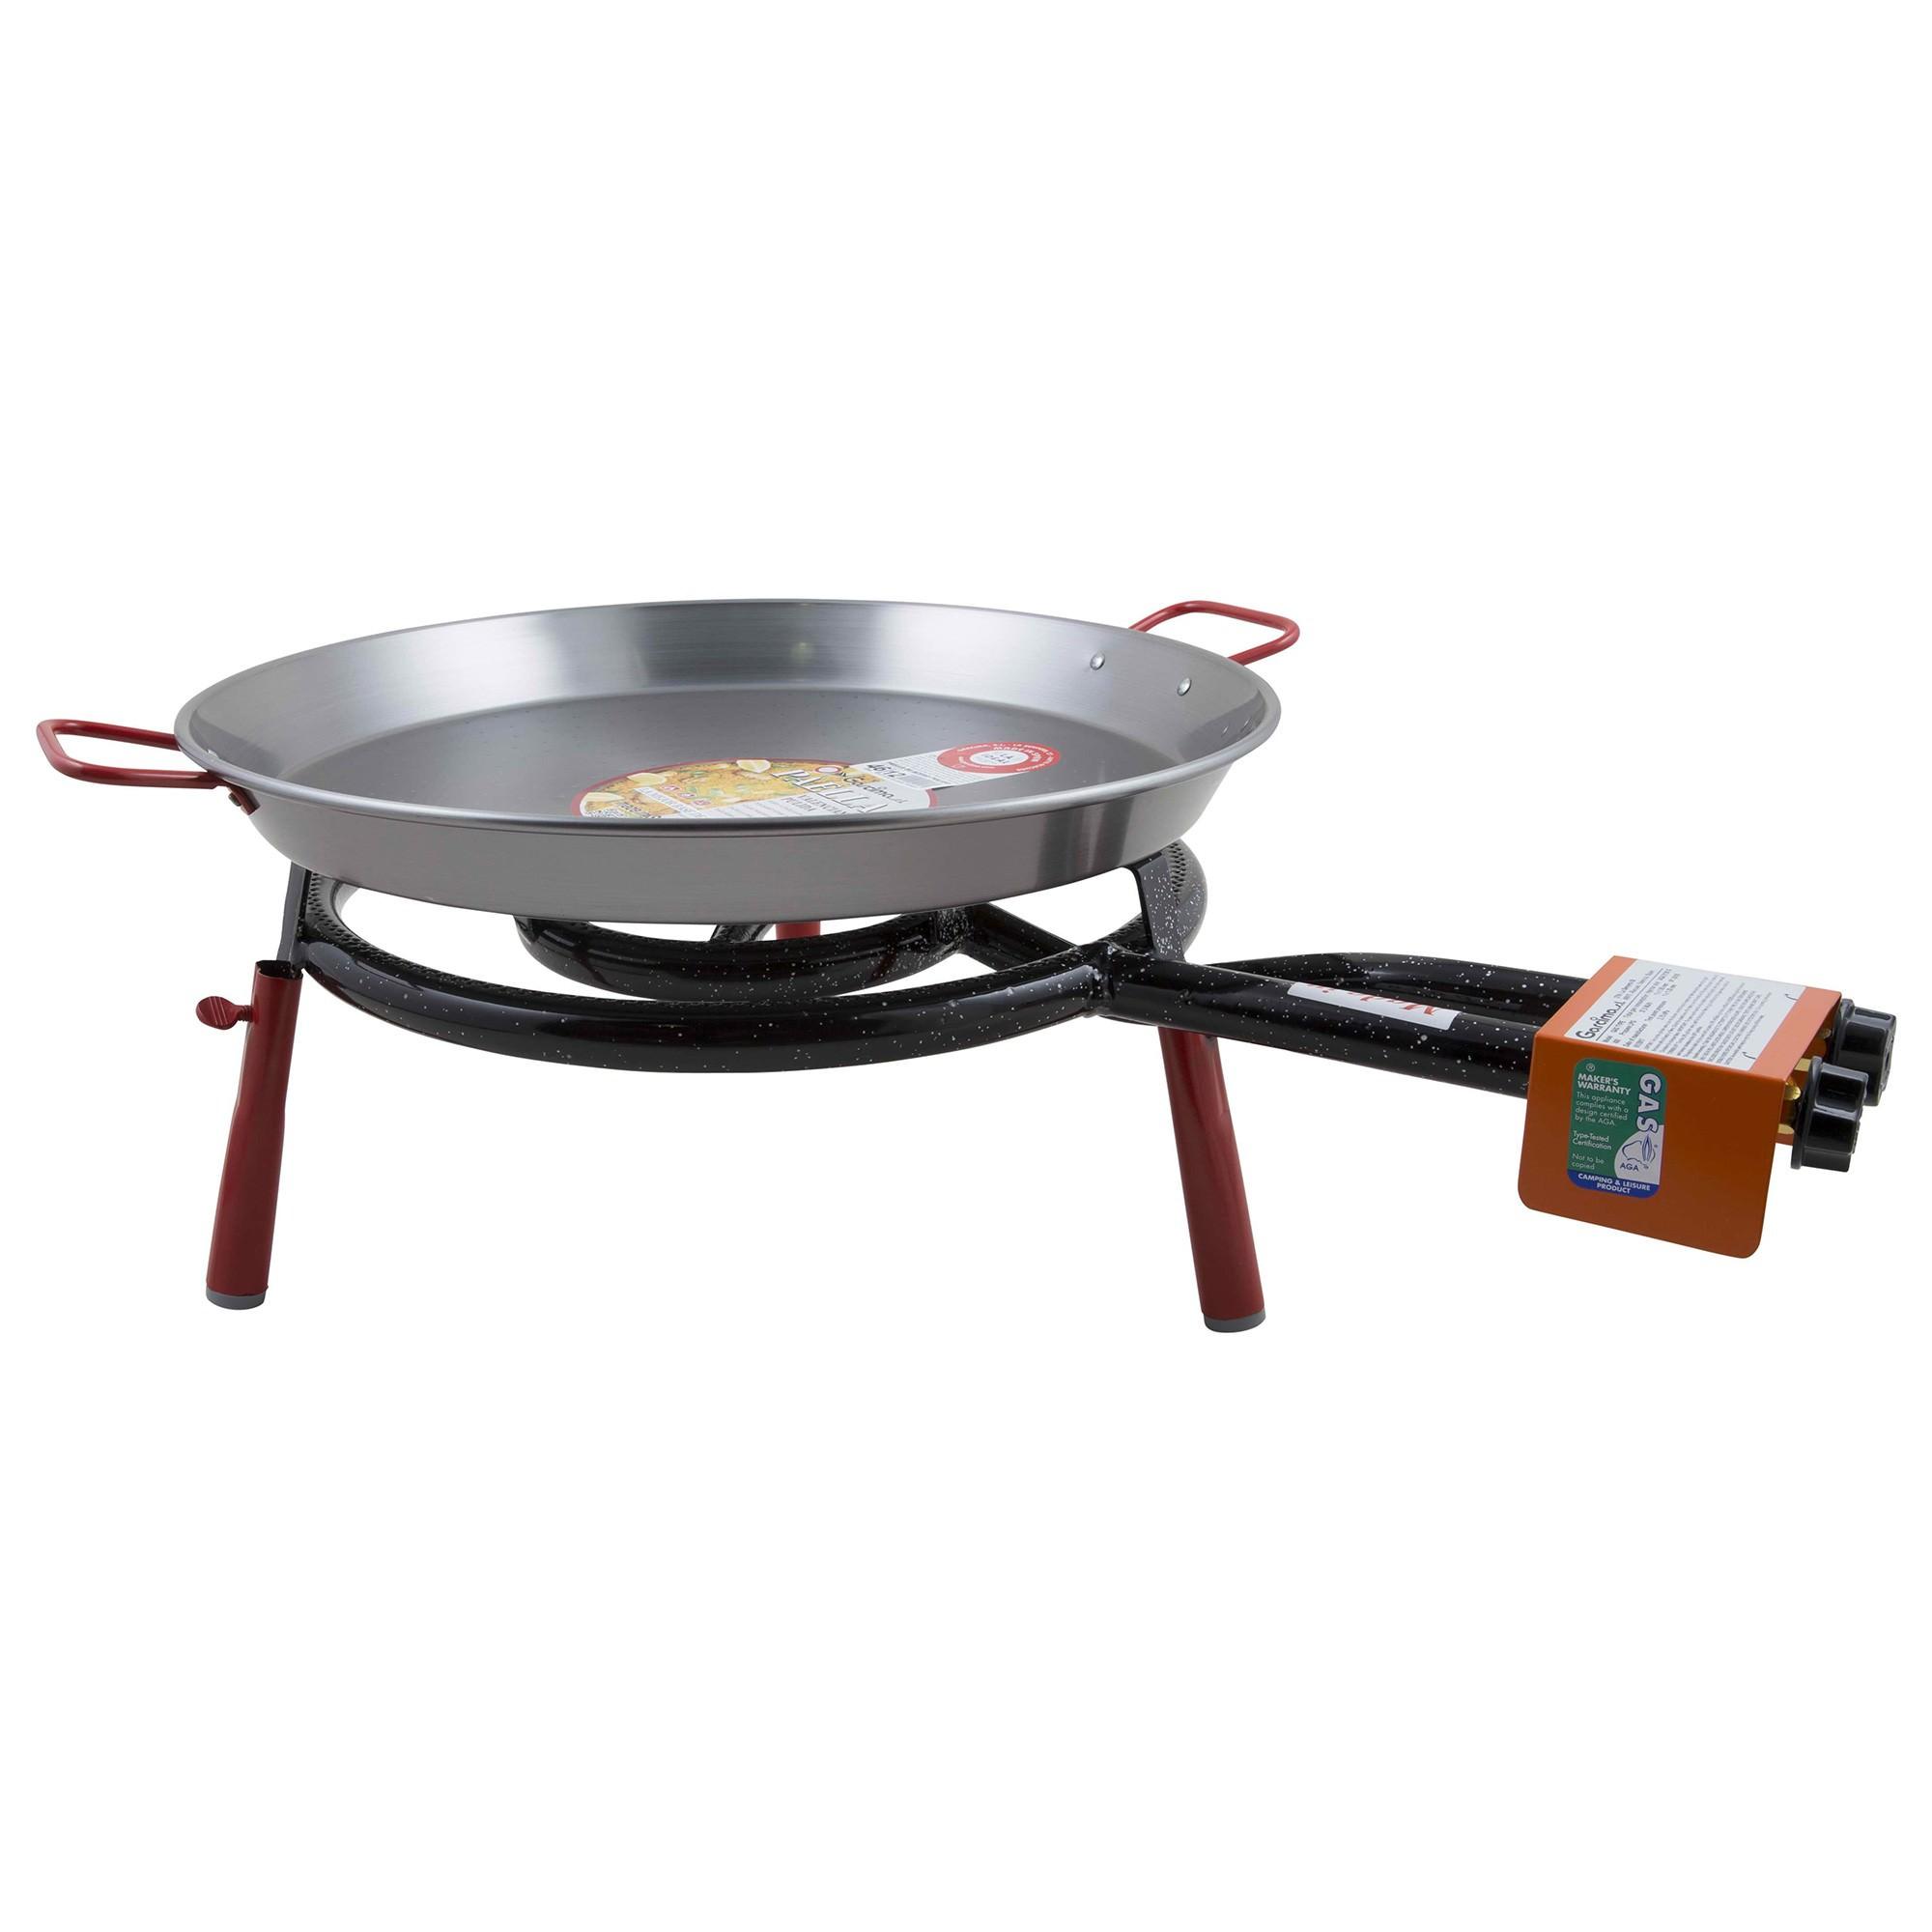 Garcima Valencia Paella Table Top Gas Burner Set